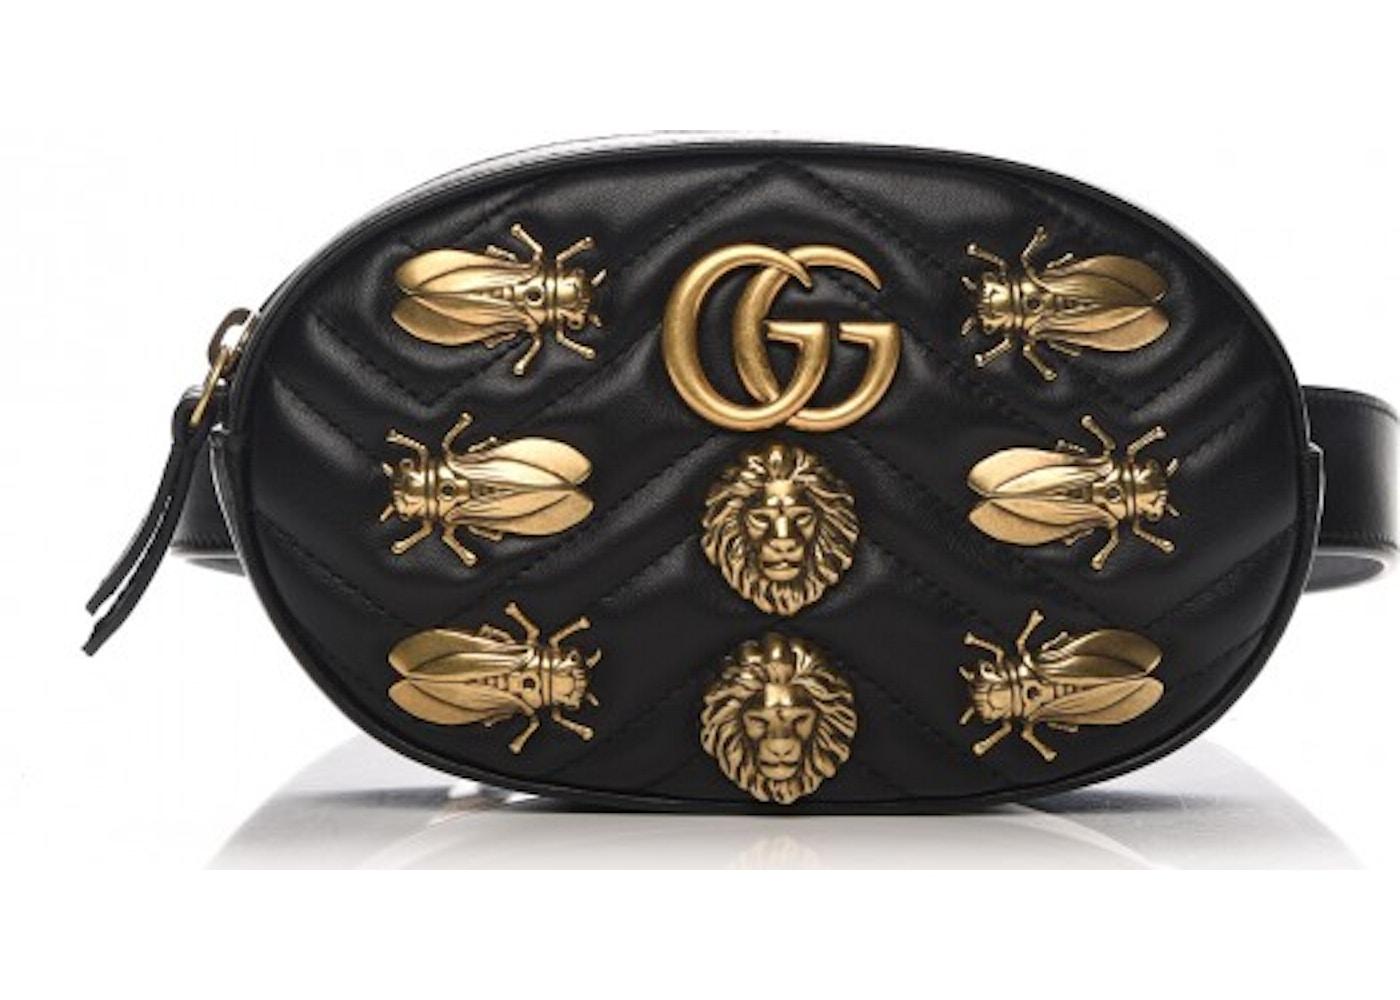 32af47ff7e7 Gucci Animal Studs Marmont Belt 85 Matelasse Black. Matelasse Black